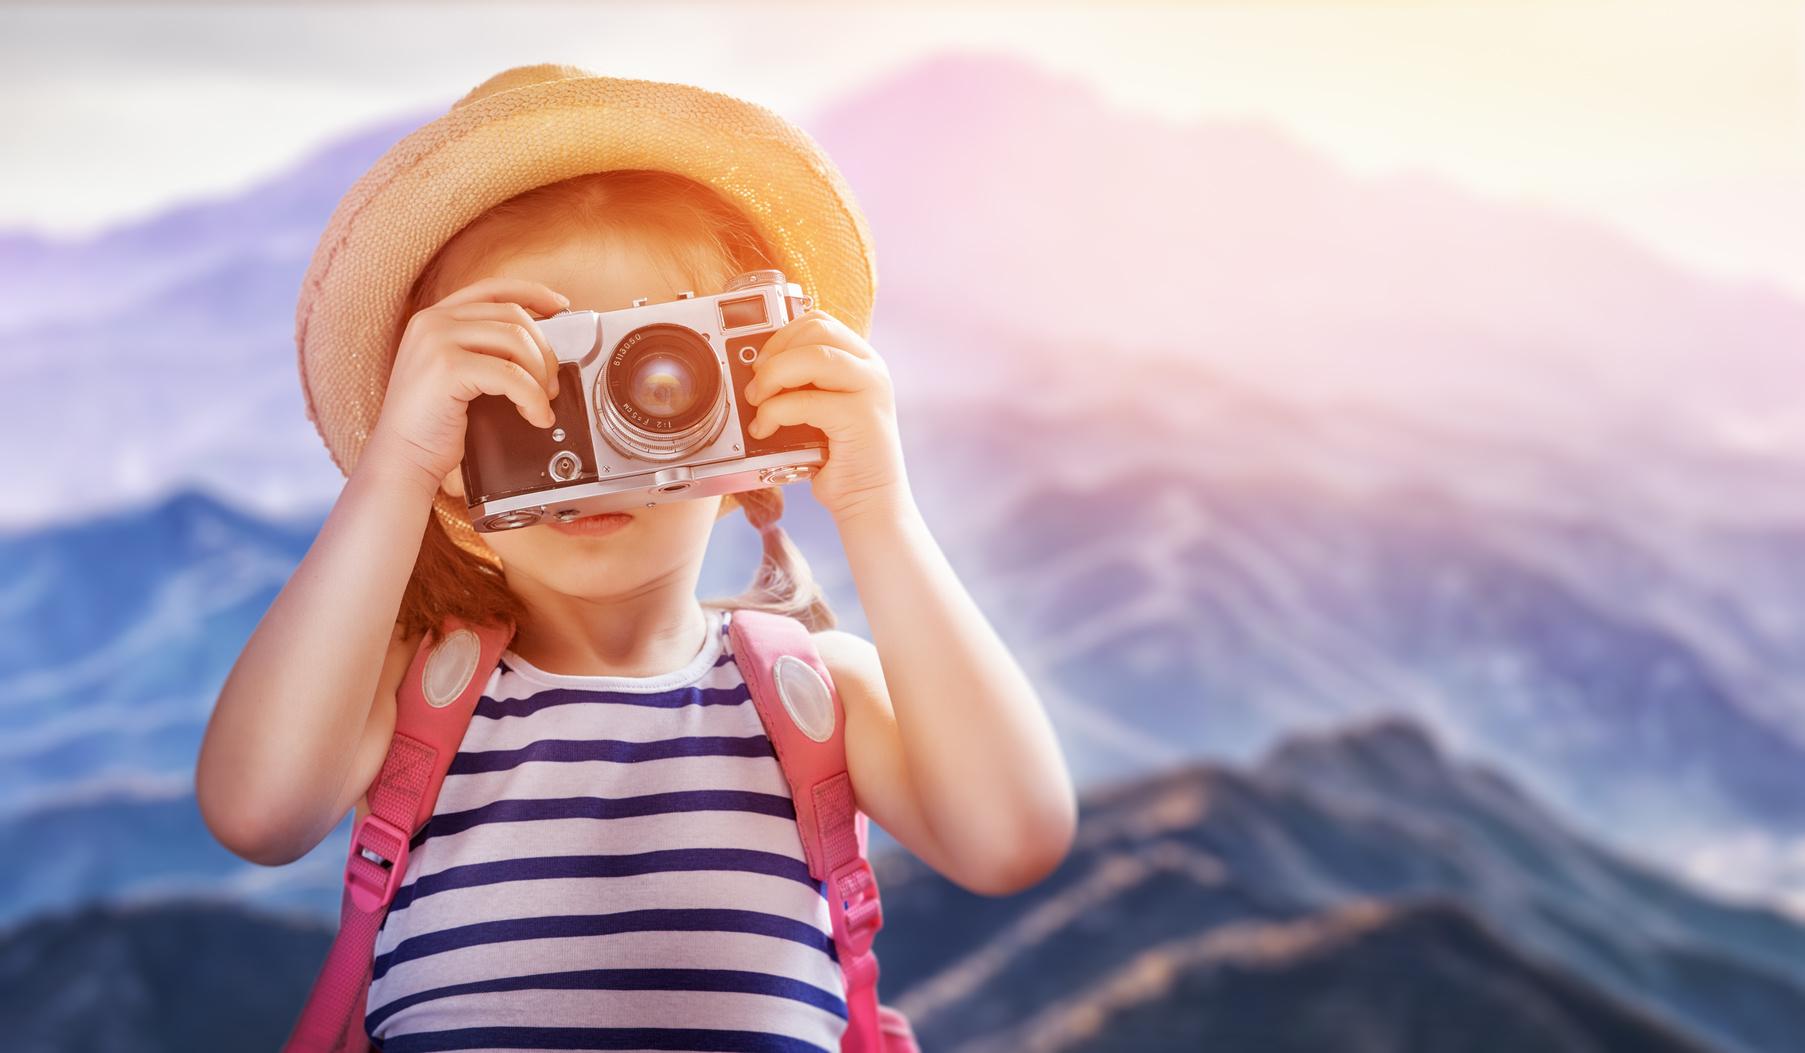 Kind mit Digitalkamera